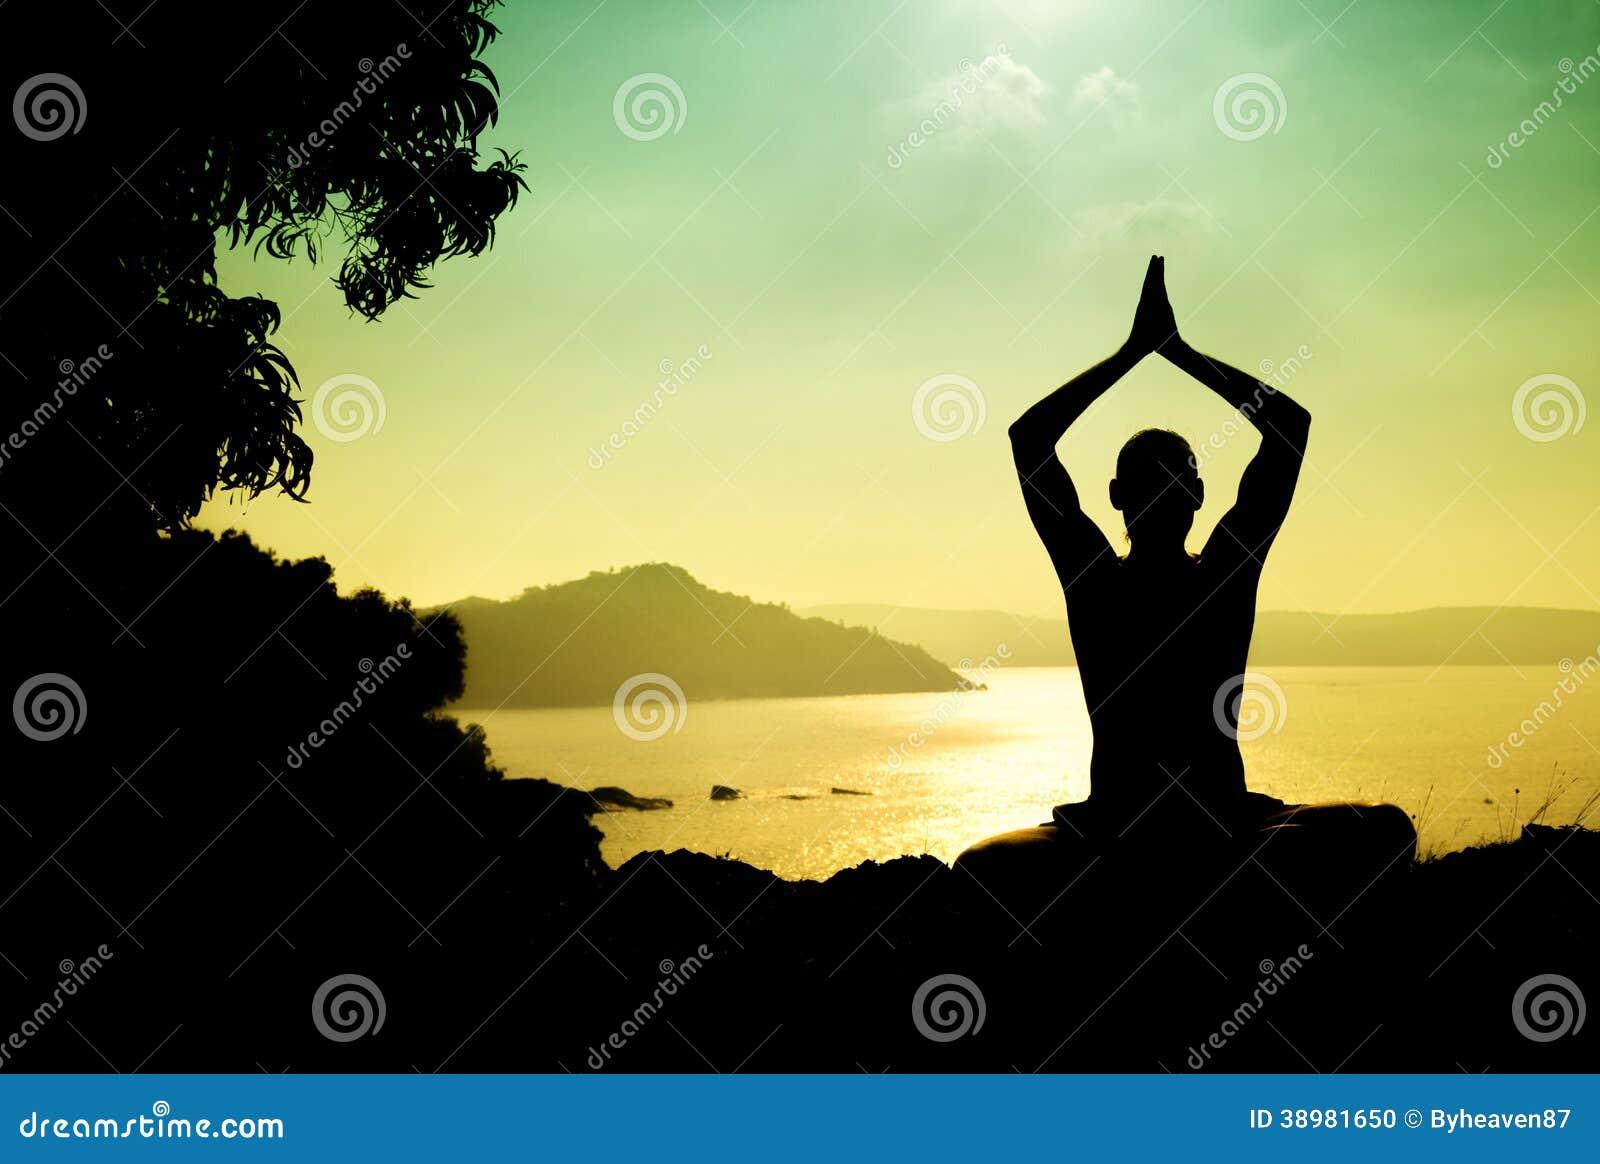 Man silhouette in Yoga meditation pose near the ocean in Gokarna    Yoga Meditation Pose Silhouette